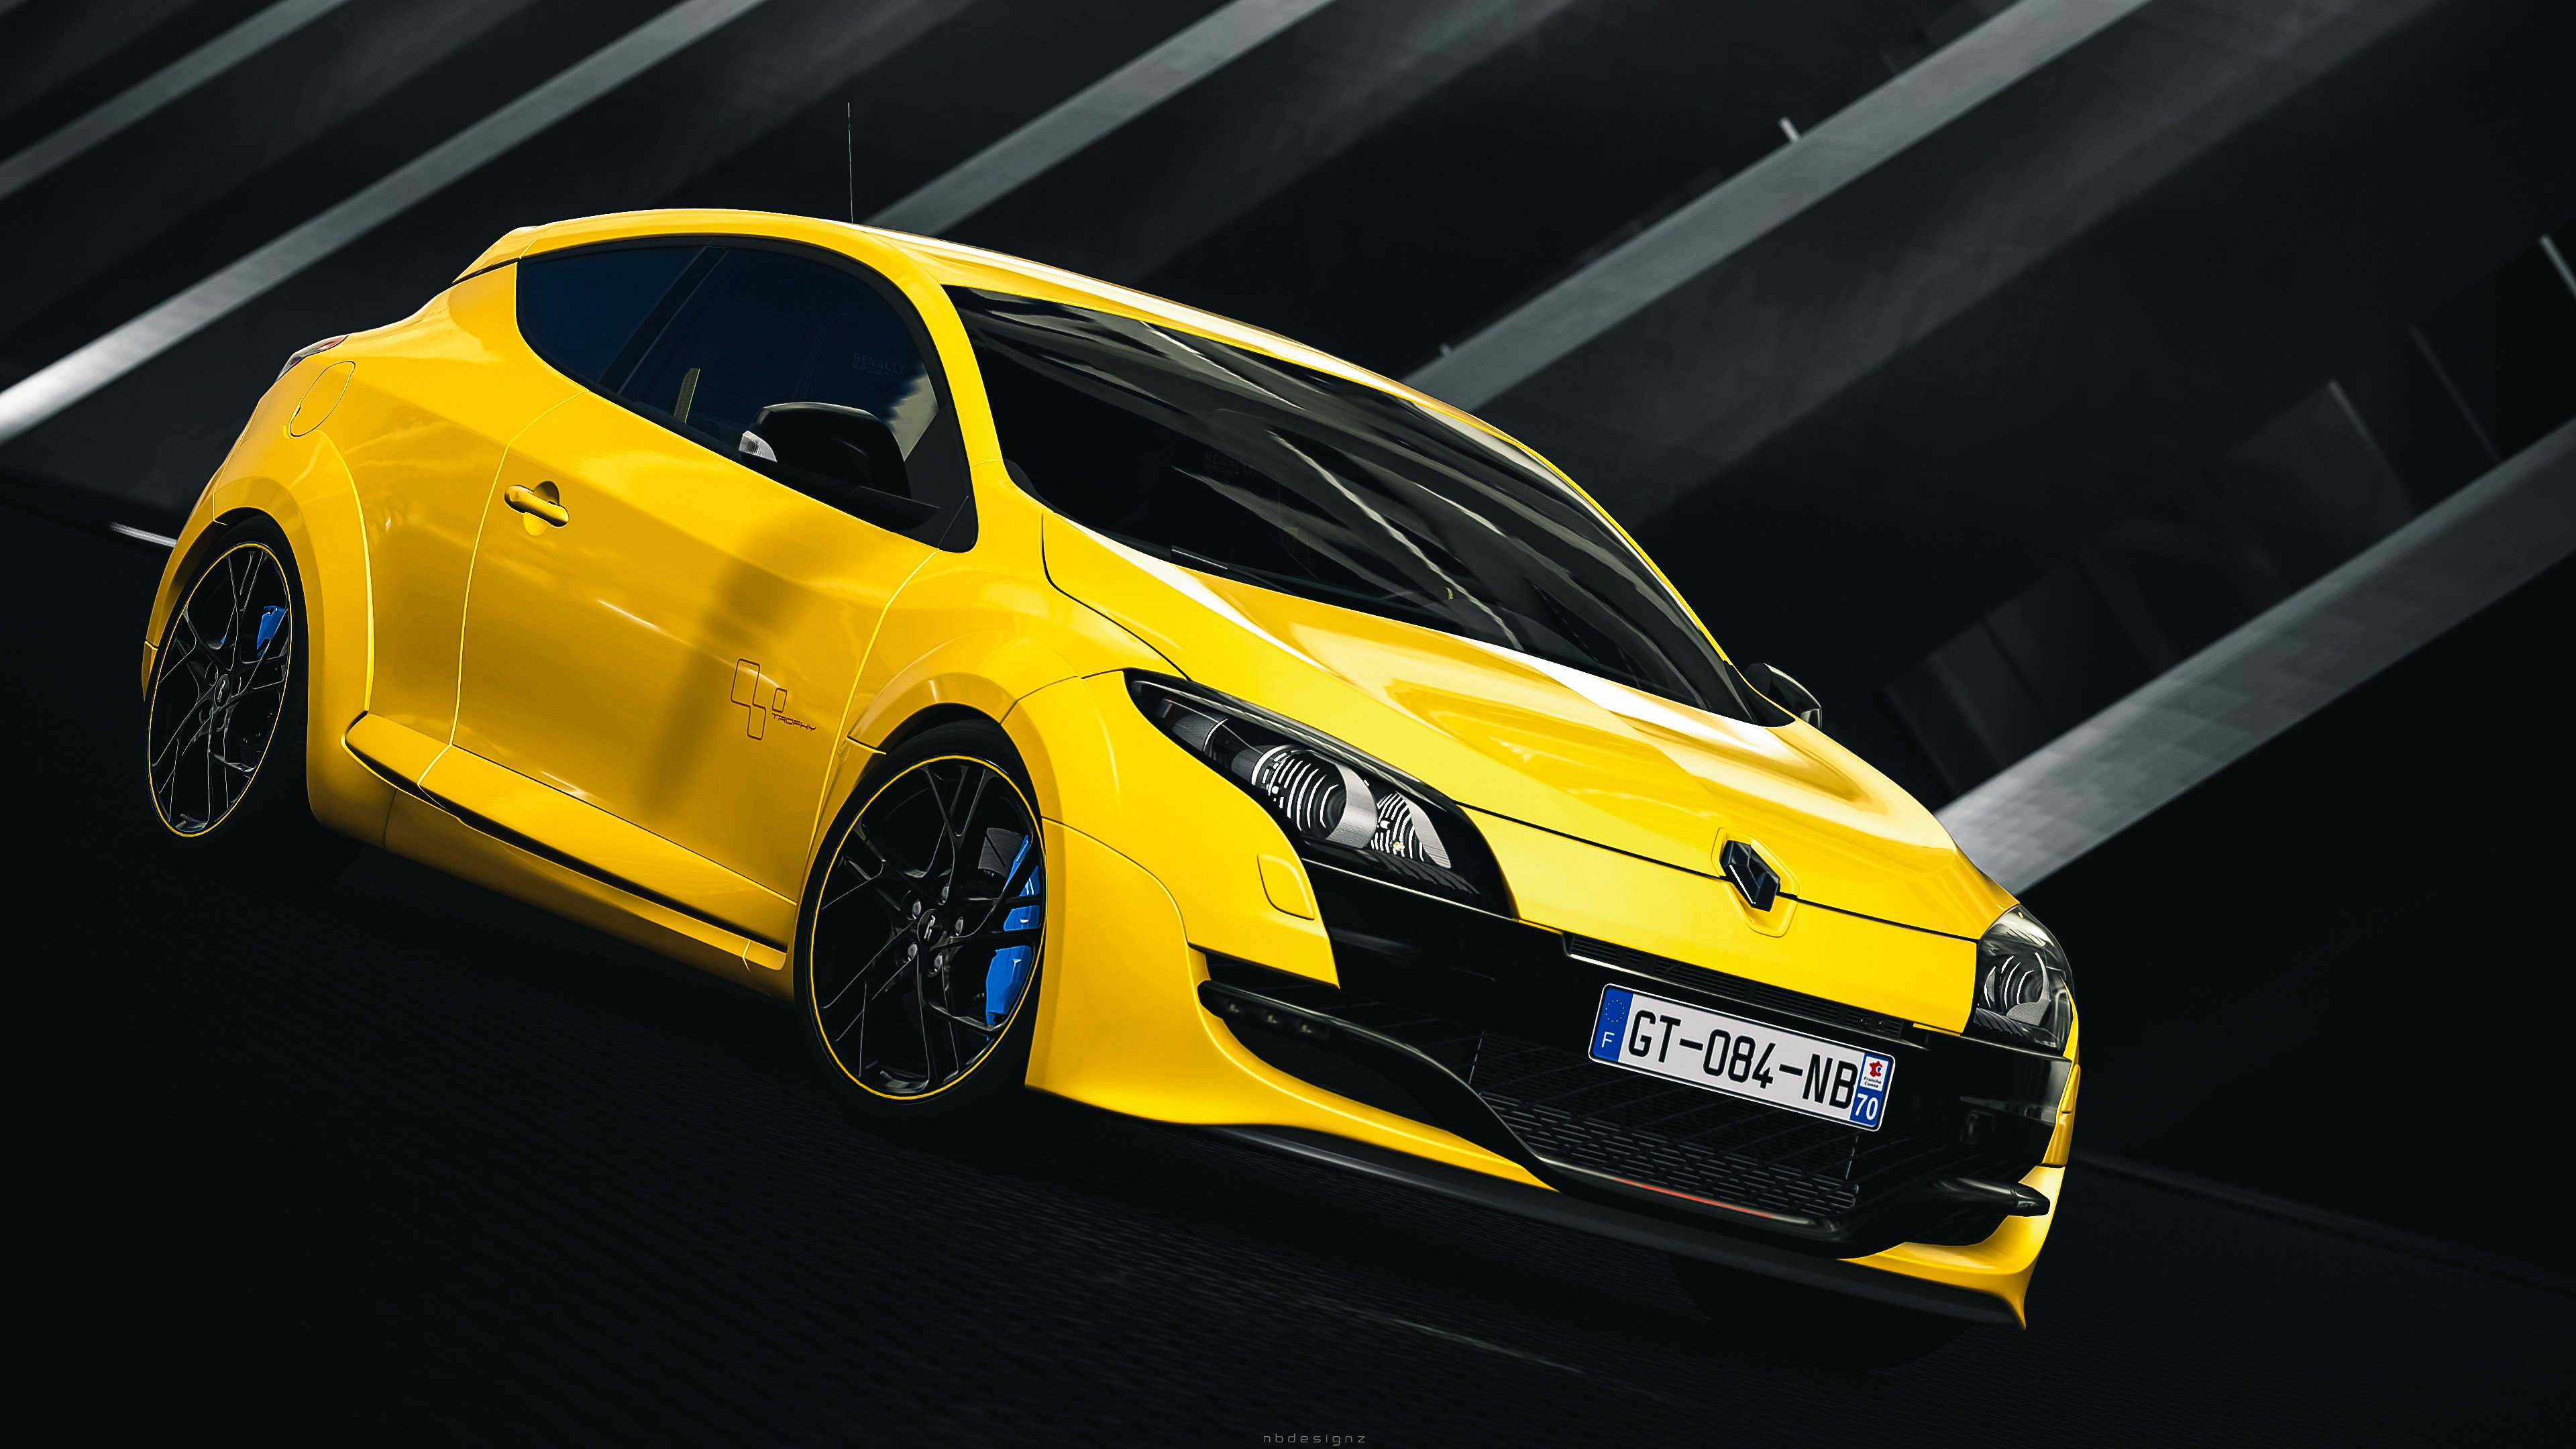 2010 New Megane Renault Sport 3 Wallpaper: Vehicles Renault Megane Renault Sport Vehicle Wallpaper